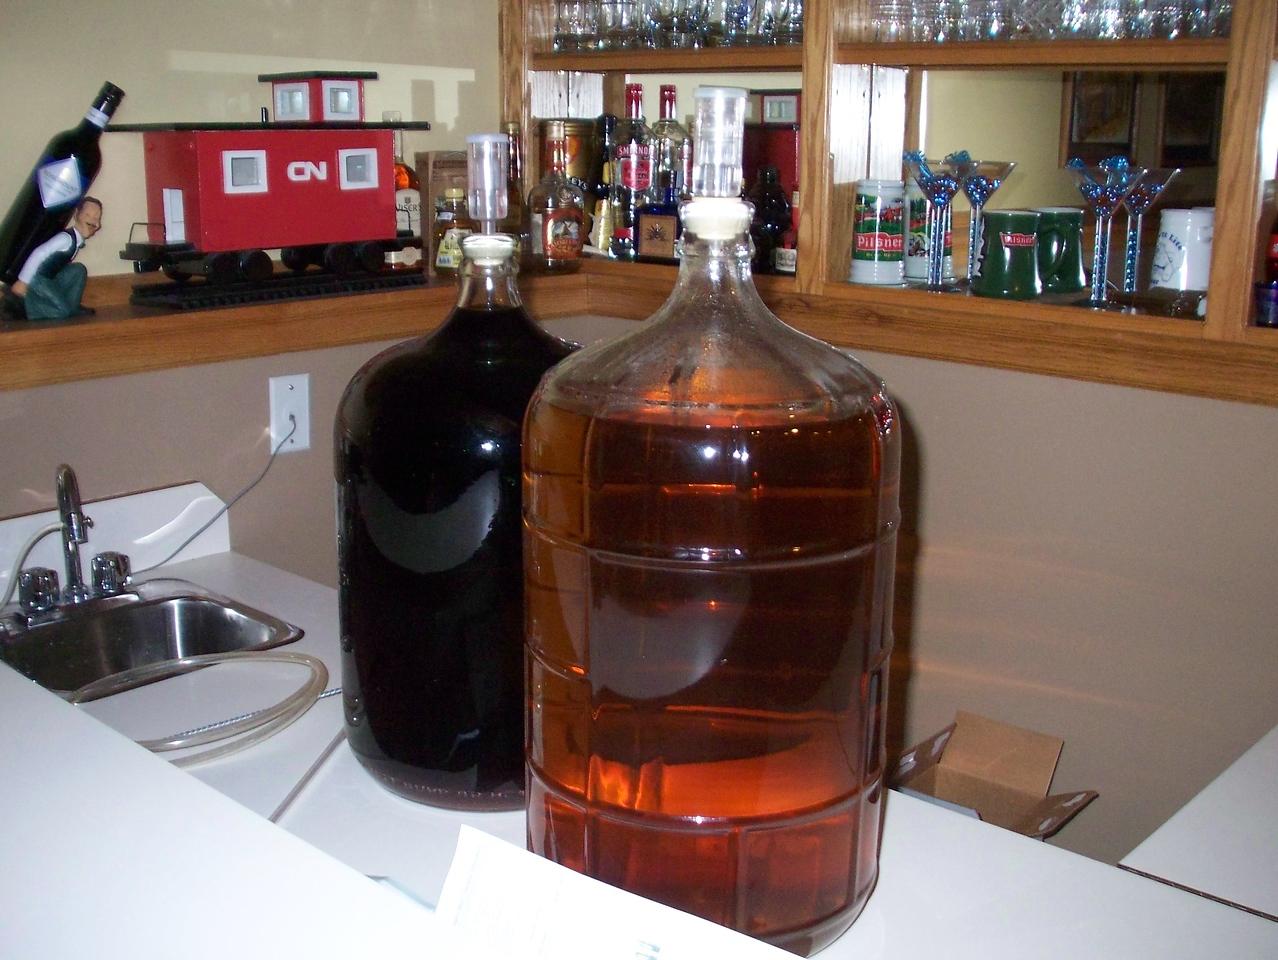 Armand's soon to be homemade wine.